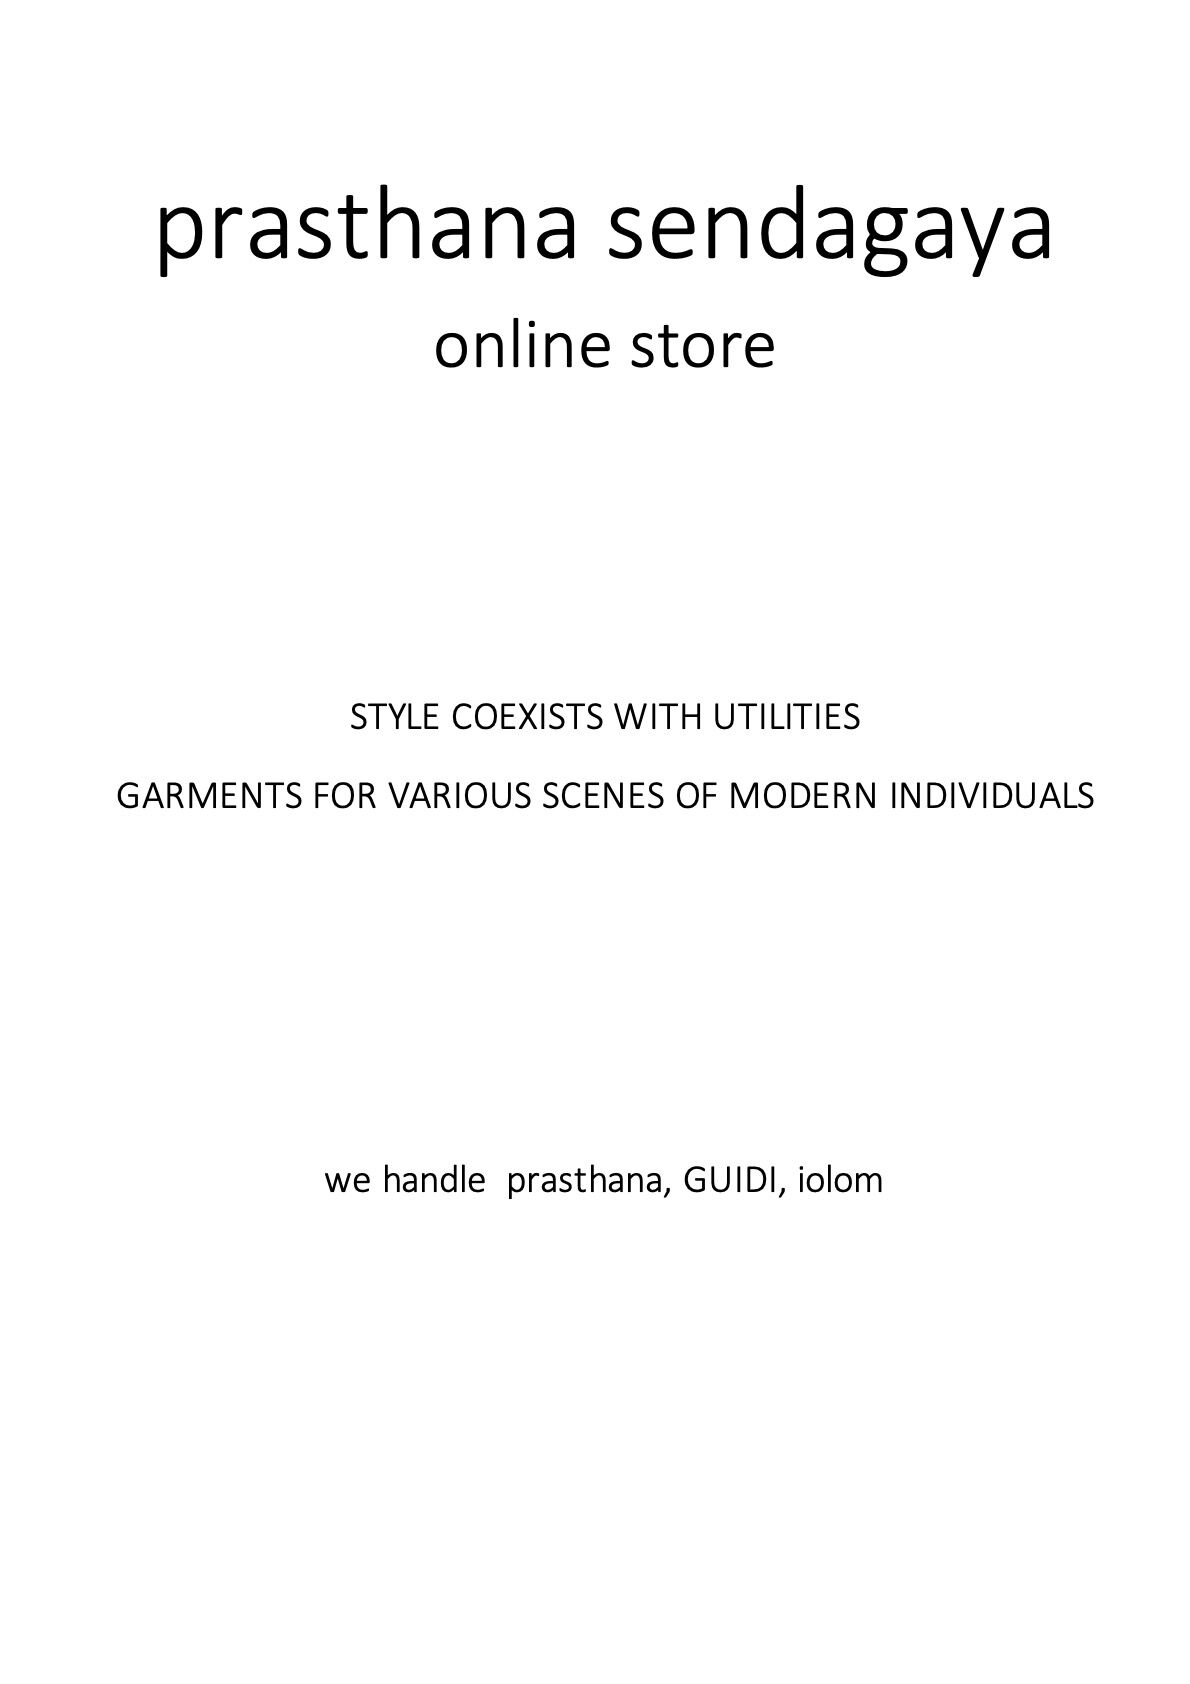 prasthana sendagaya official online store